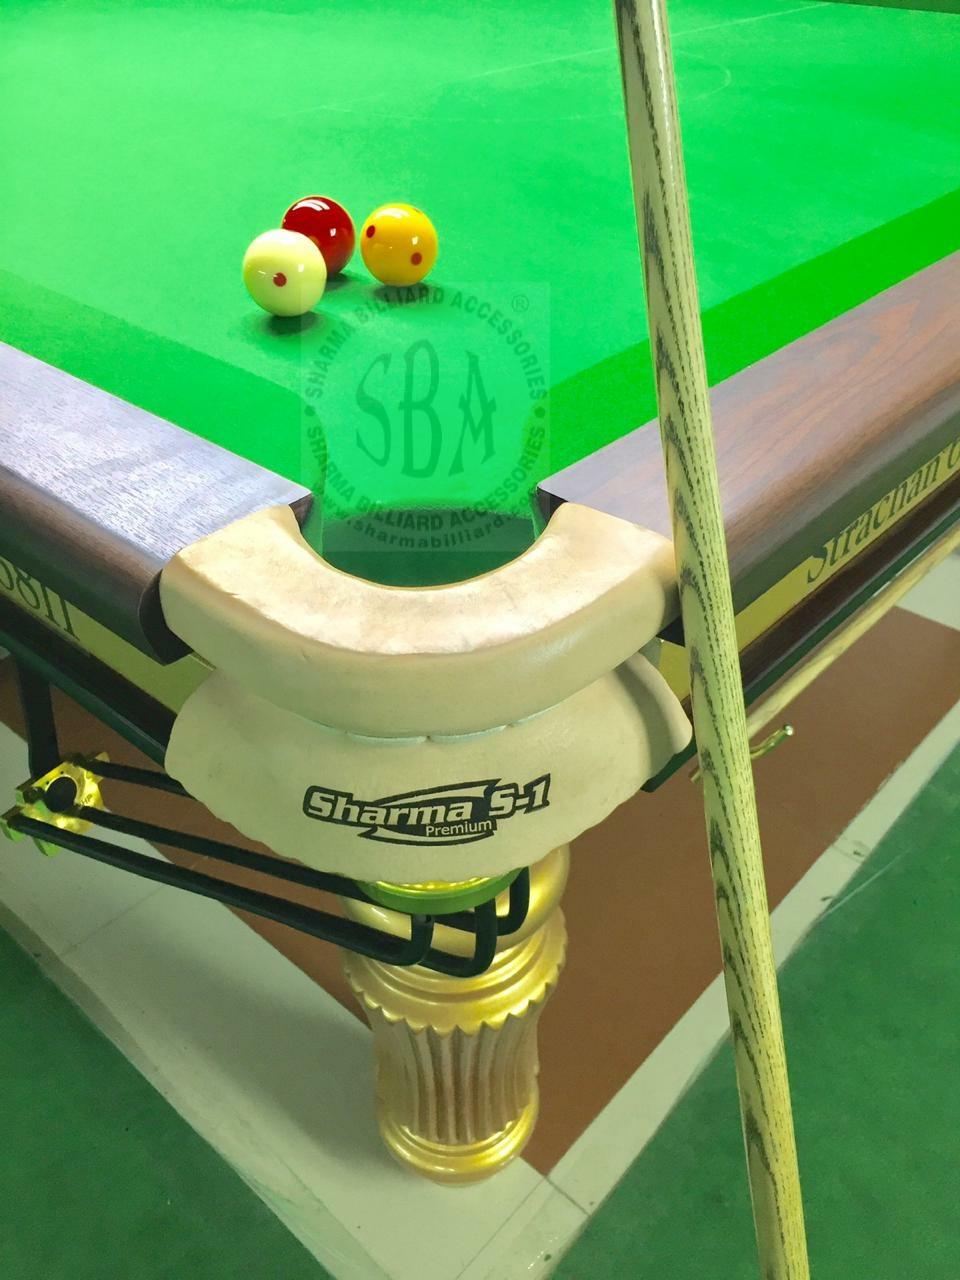 Sharma S-1 Premium Billiard Table (BSFI APPROVED)